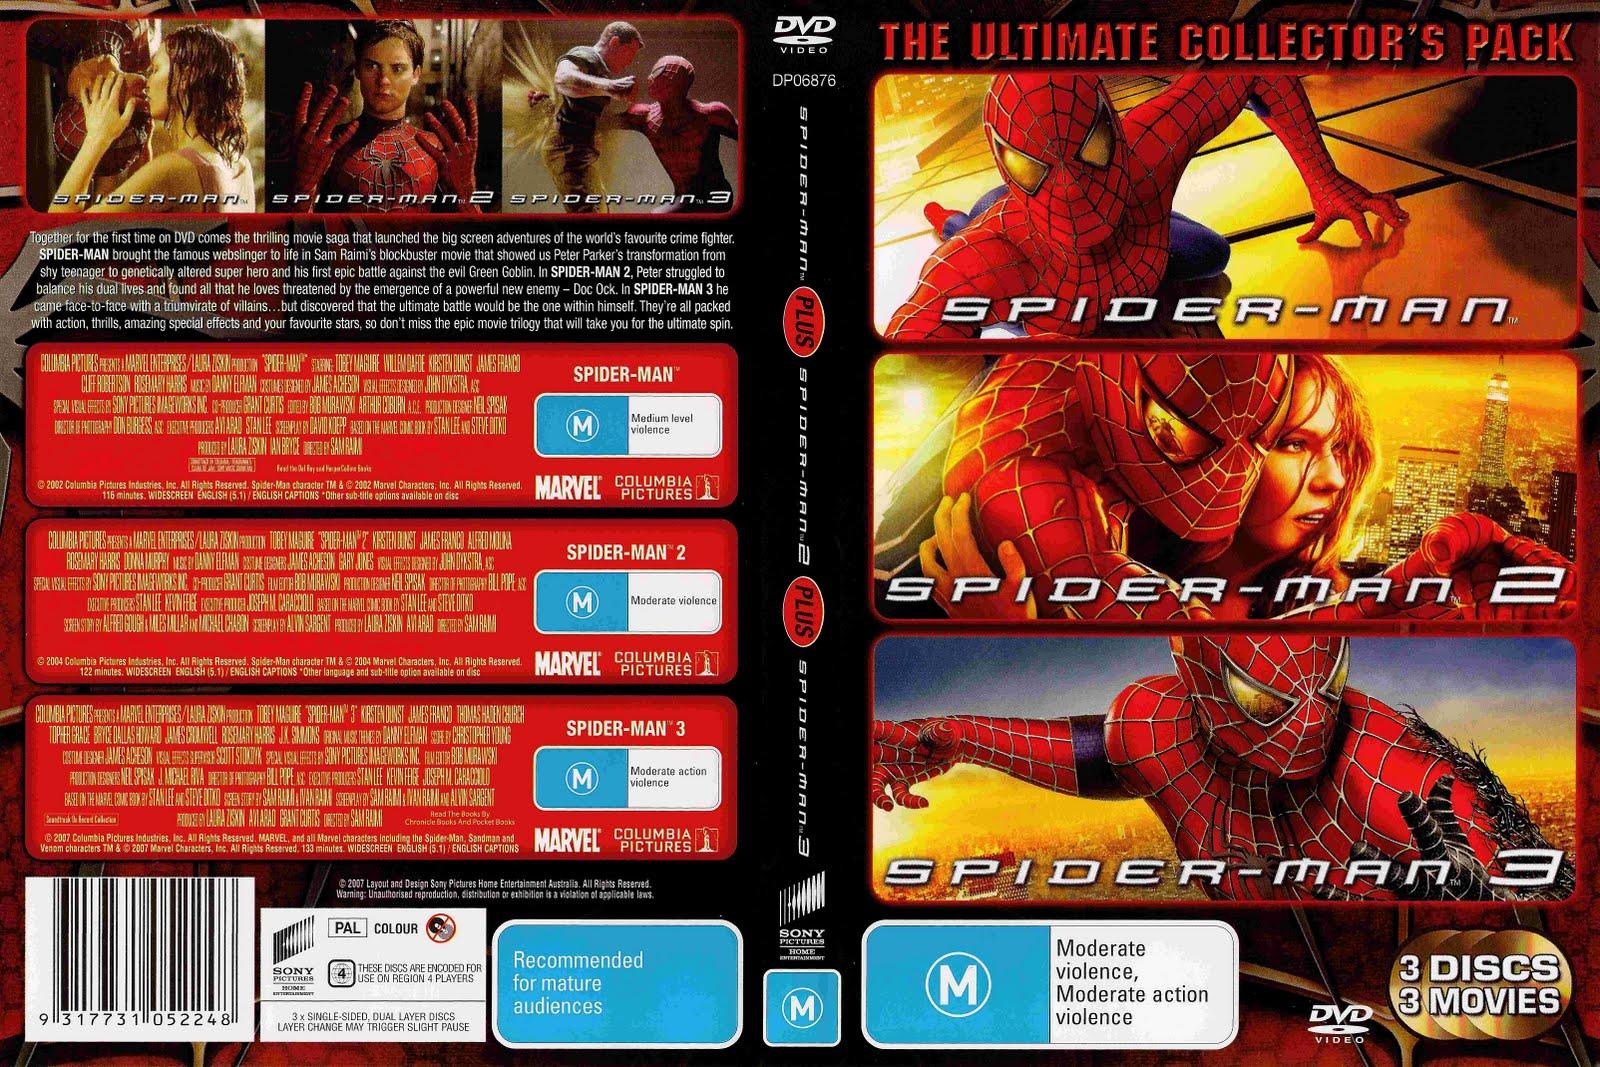 Trilogia Homem Aranha DVDRip Dual audio Homem 2BAranha 2B3 2Bem 2B1